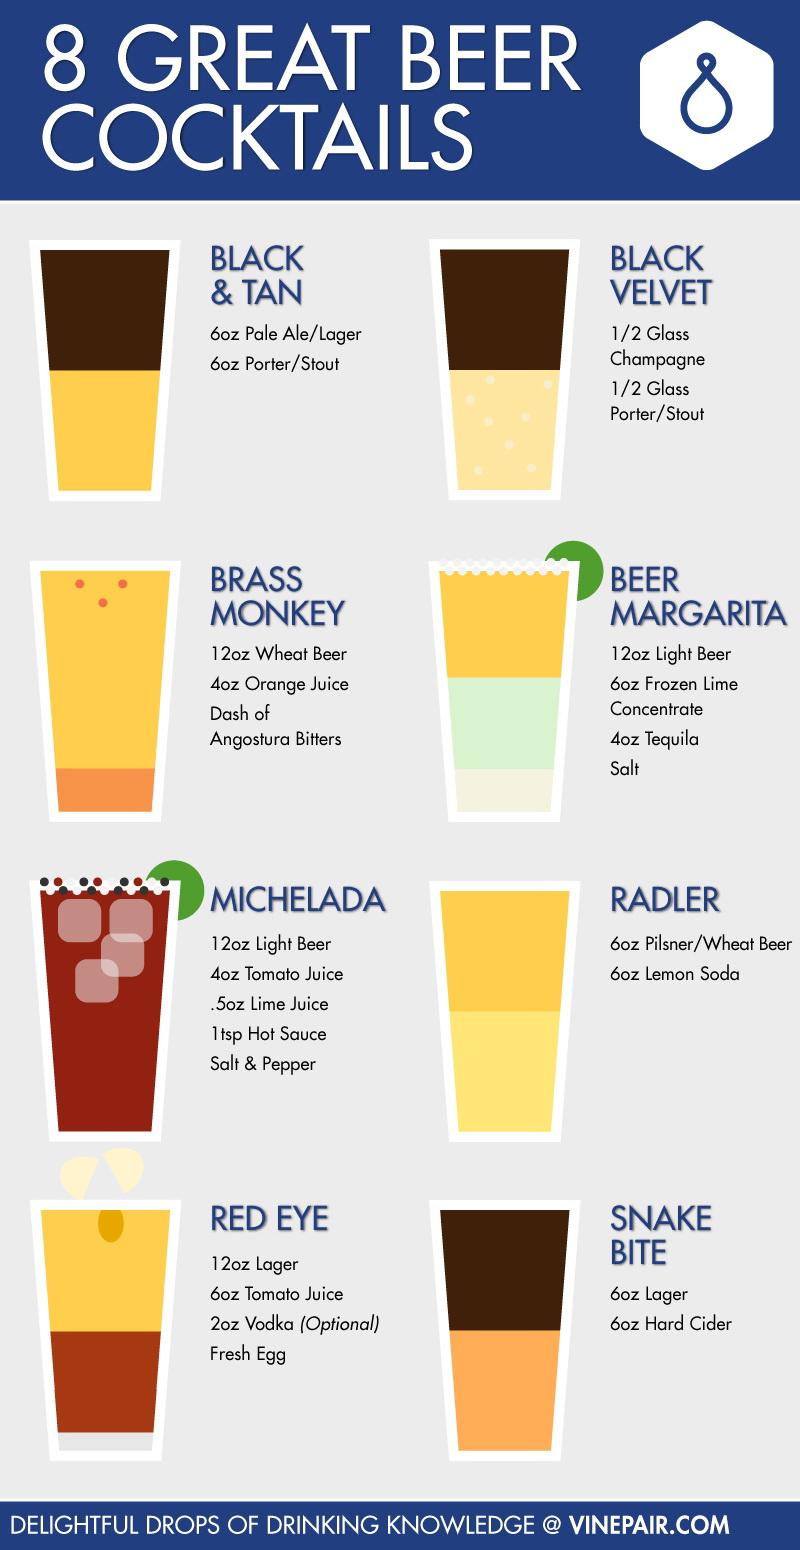 8 Great Beer Coctails